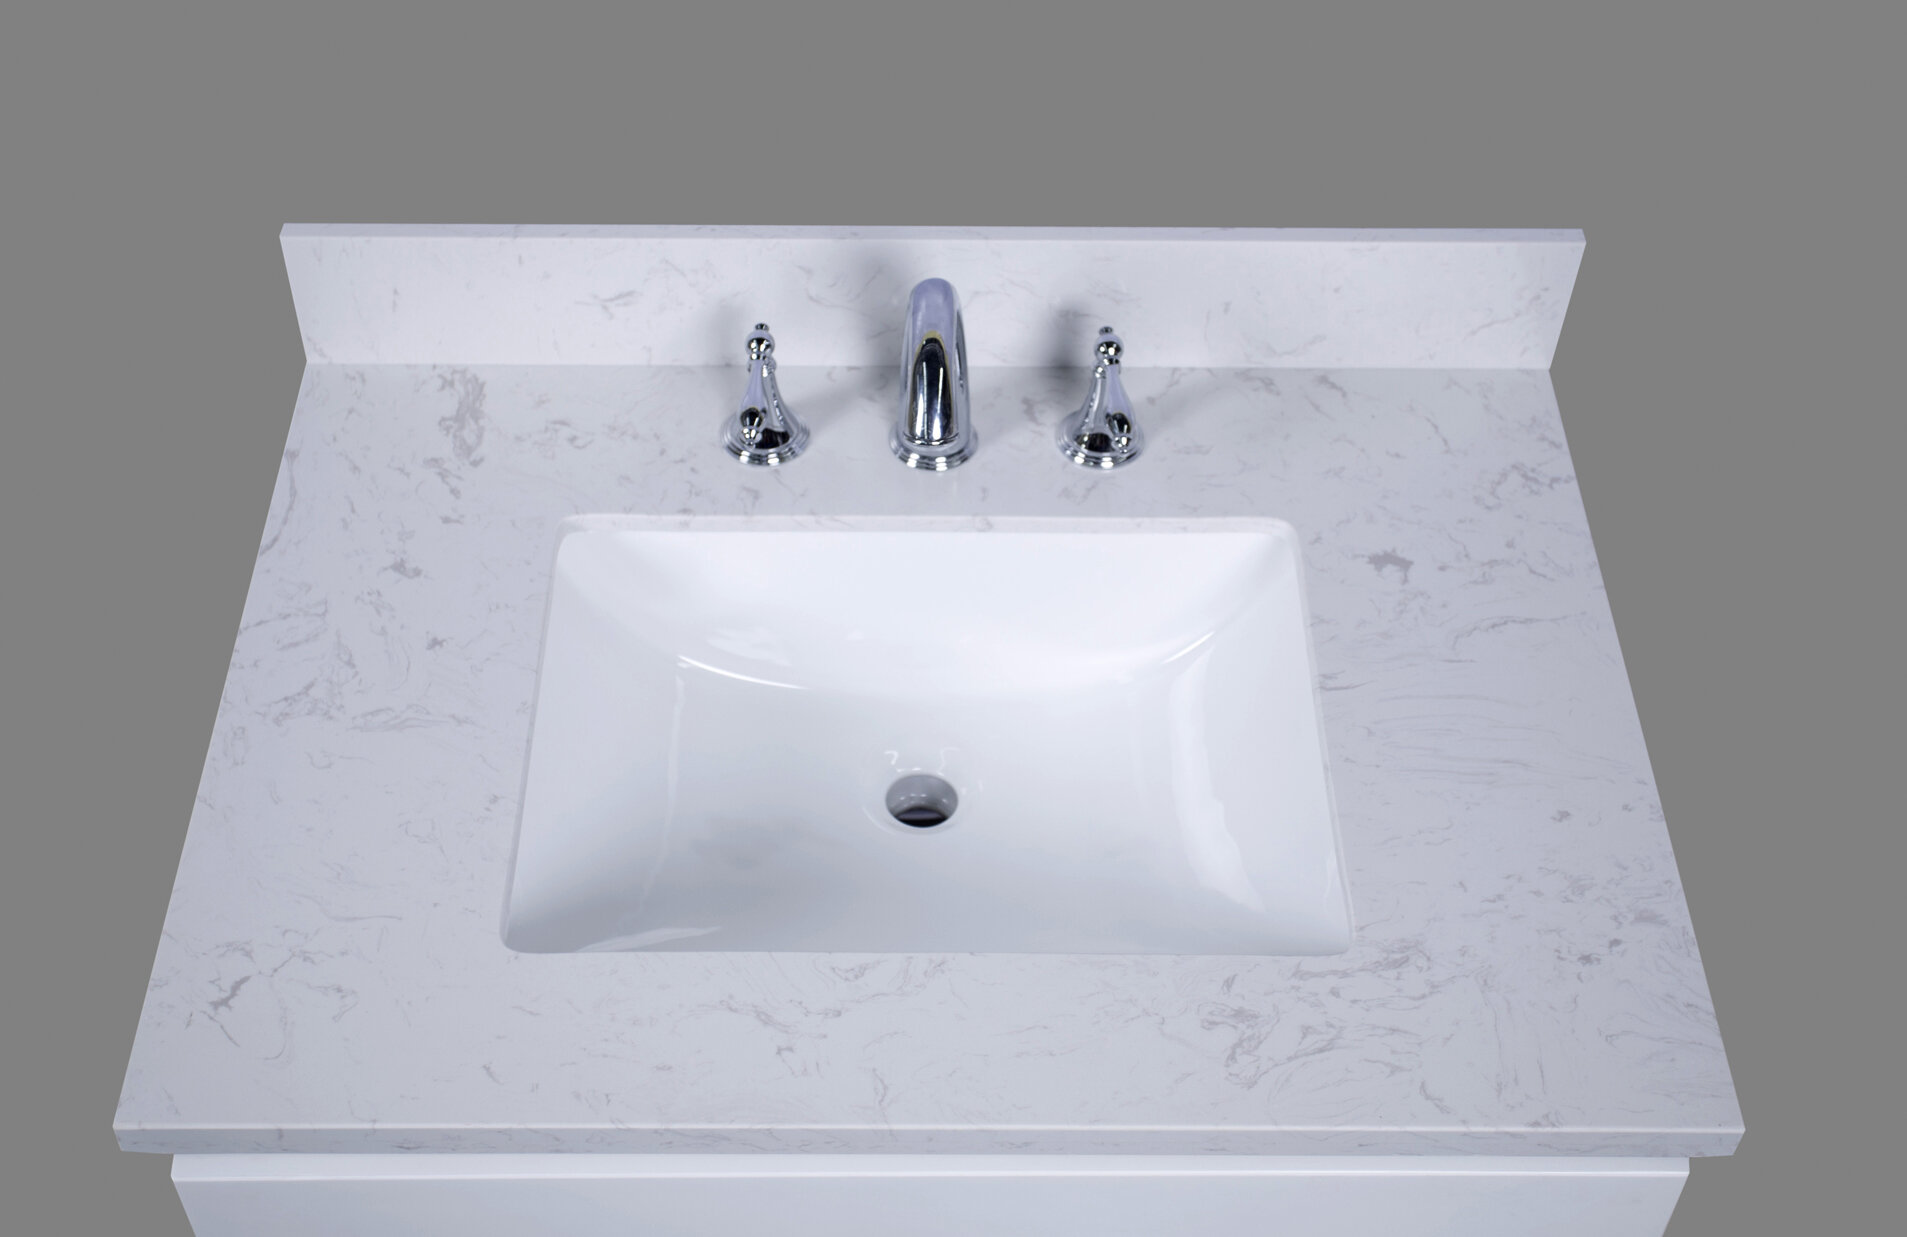 Marvelous Renaissancevanity Bari 31 Single Bathroom Vanity Top Beutiful Home Inspiration Semekurdistantinfo